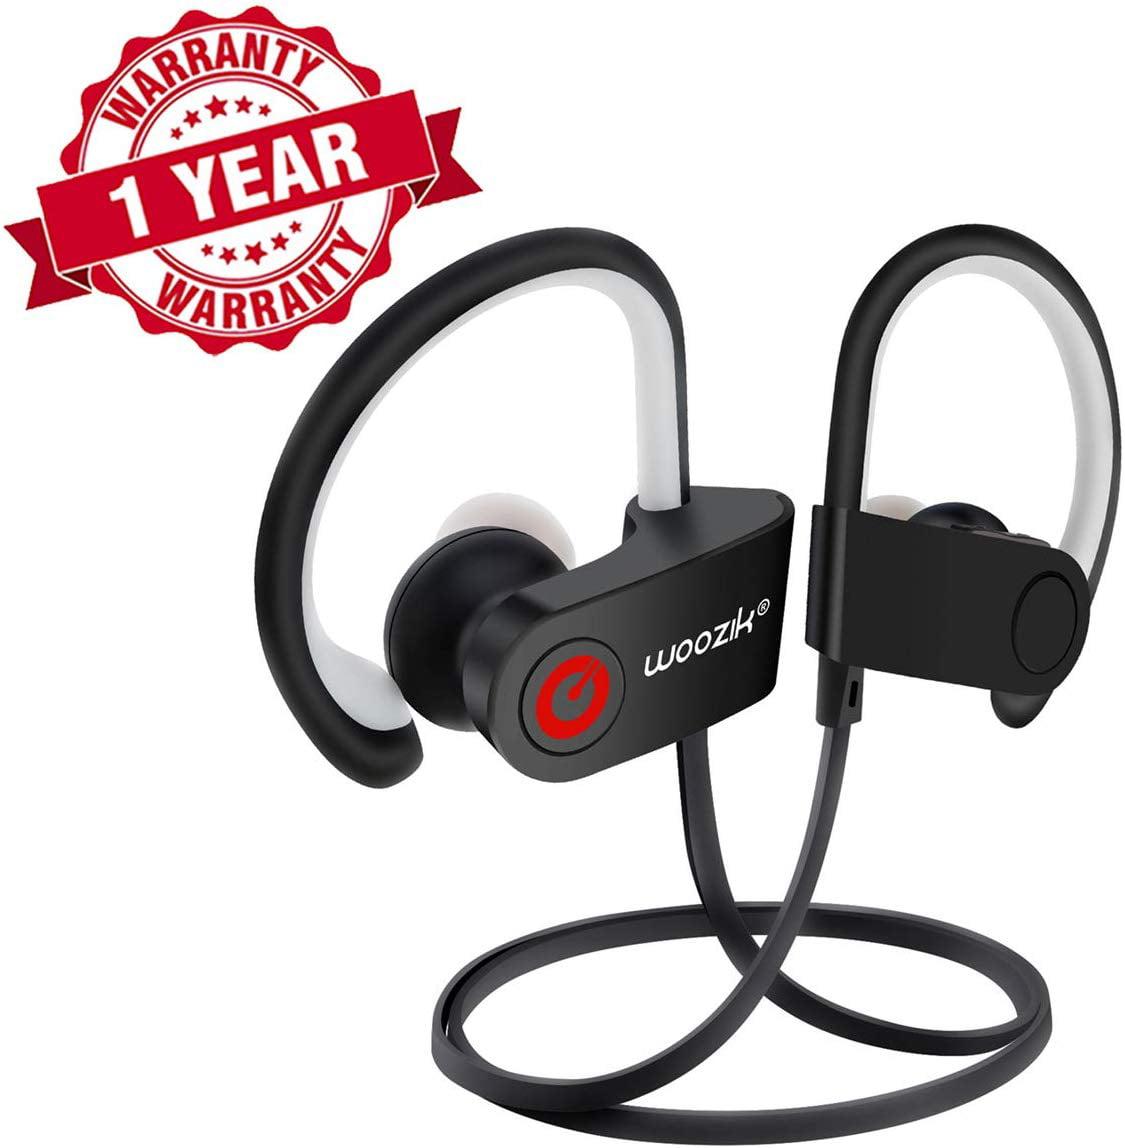 Woozik Wireless Earbuds Bluetooth Sport Headphones Ipx4 Waterproof Headset With Microphone Earhook Earphones Volume Control Black Walmart Com Walmart Com